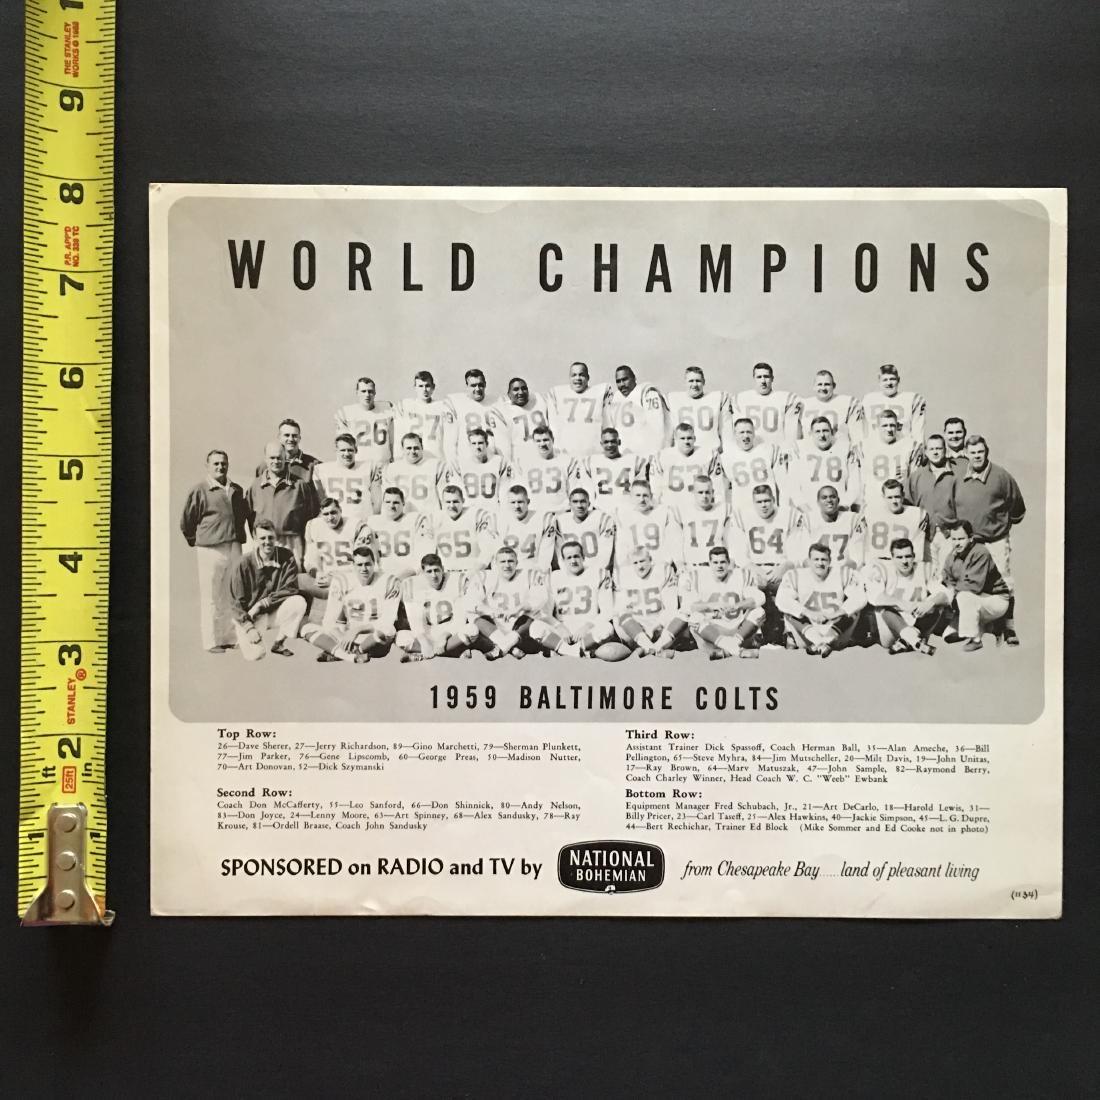 1959 BALTIMORE COLTS WORLD CHAMPIONS PHOTO